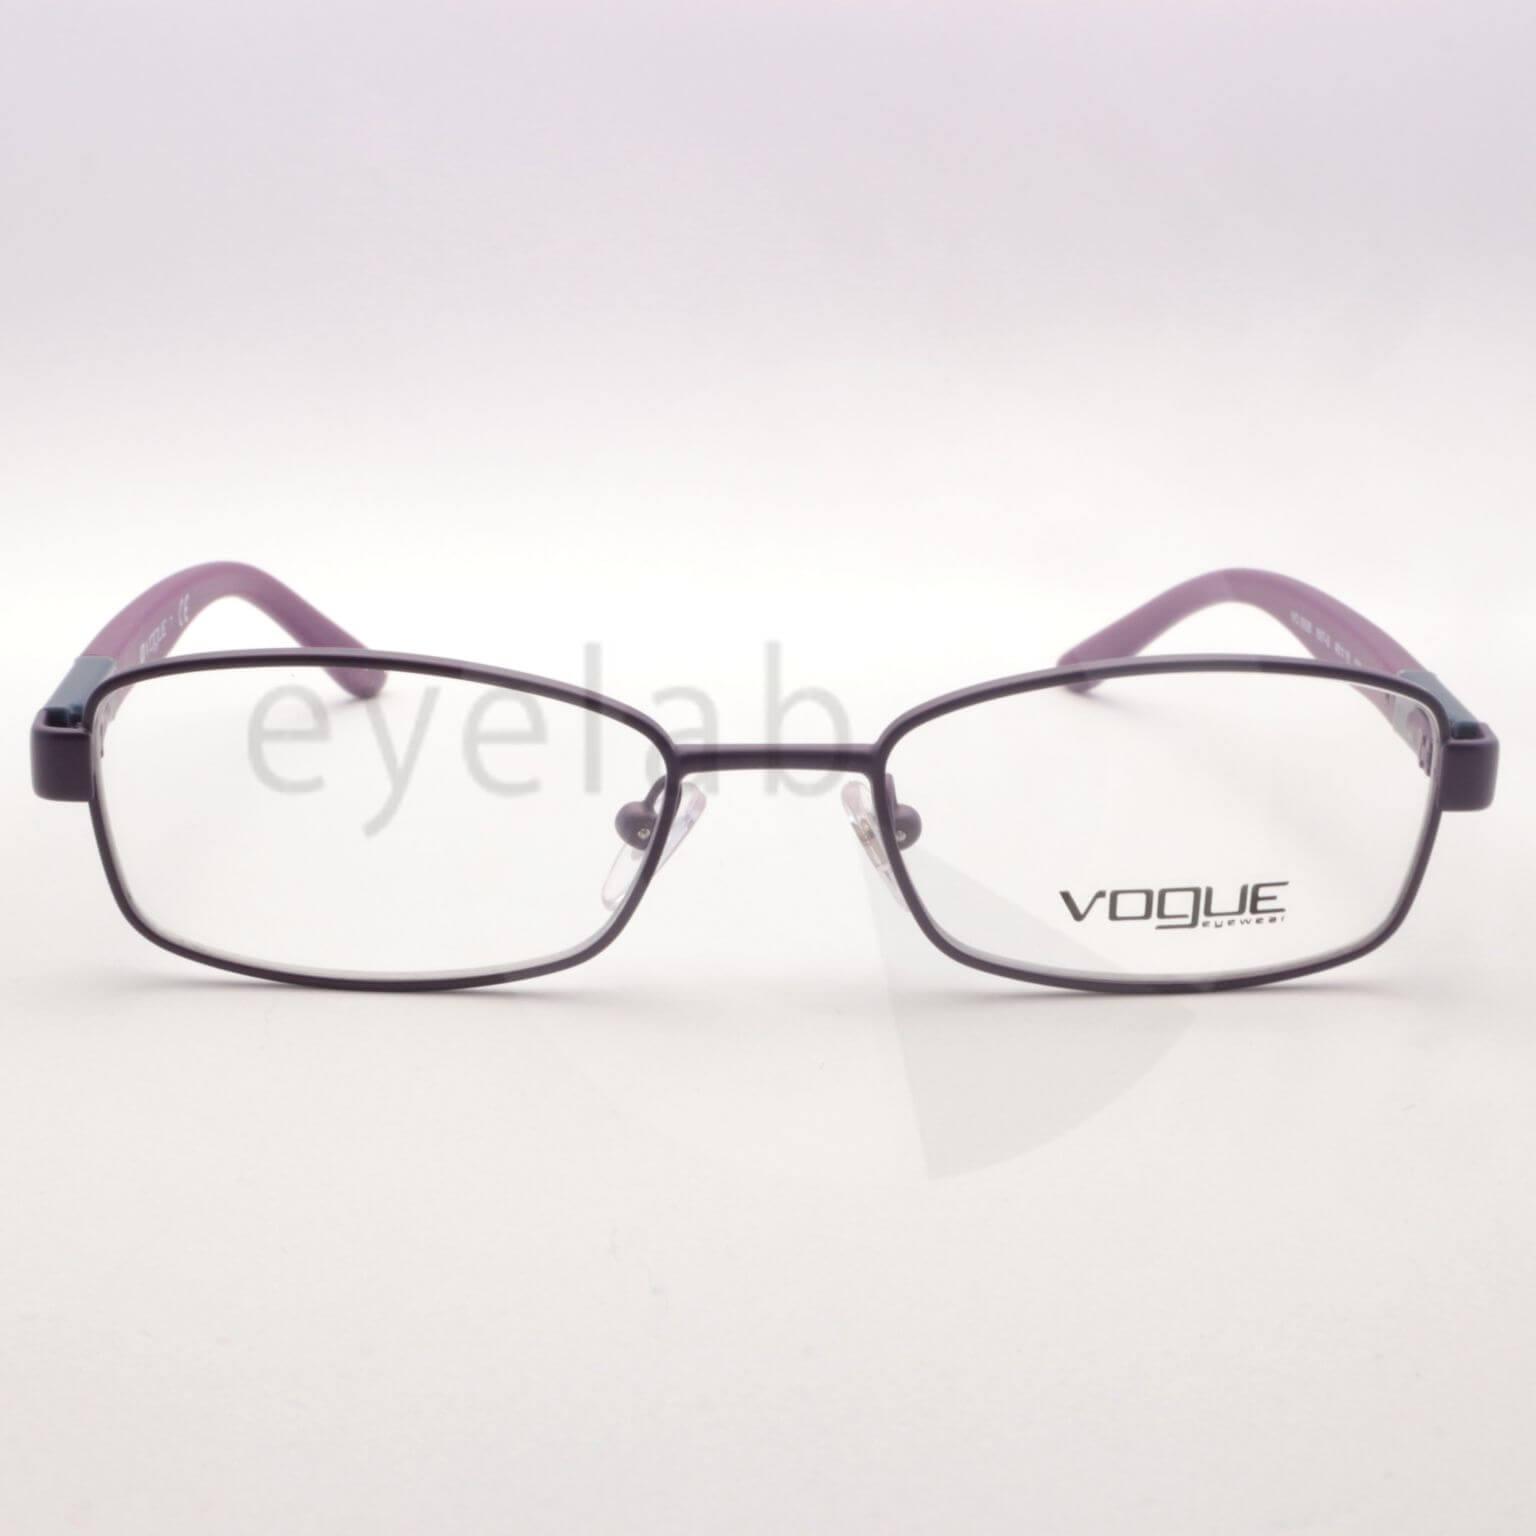 8bbf7df146 Vogue 3926 897-S 46 ~ Eyelab